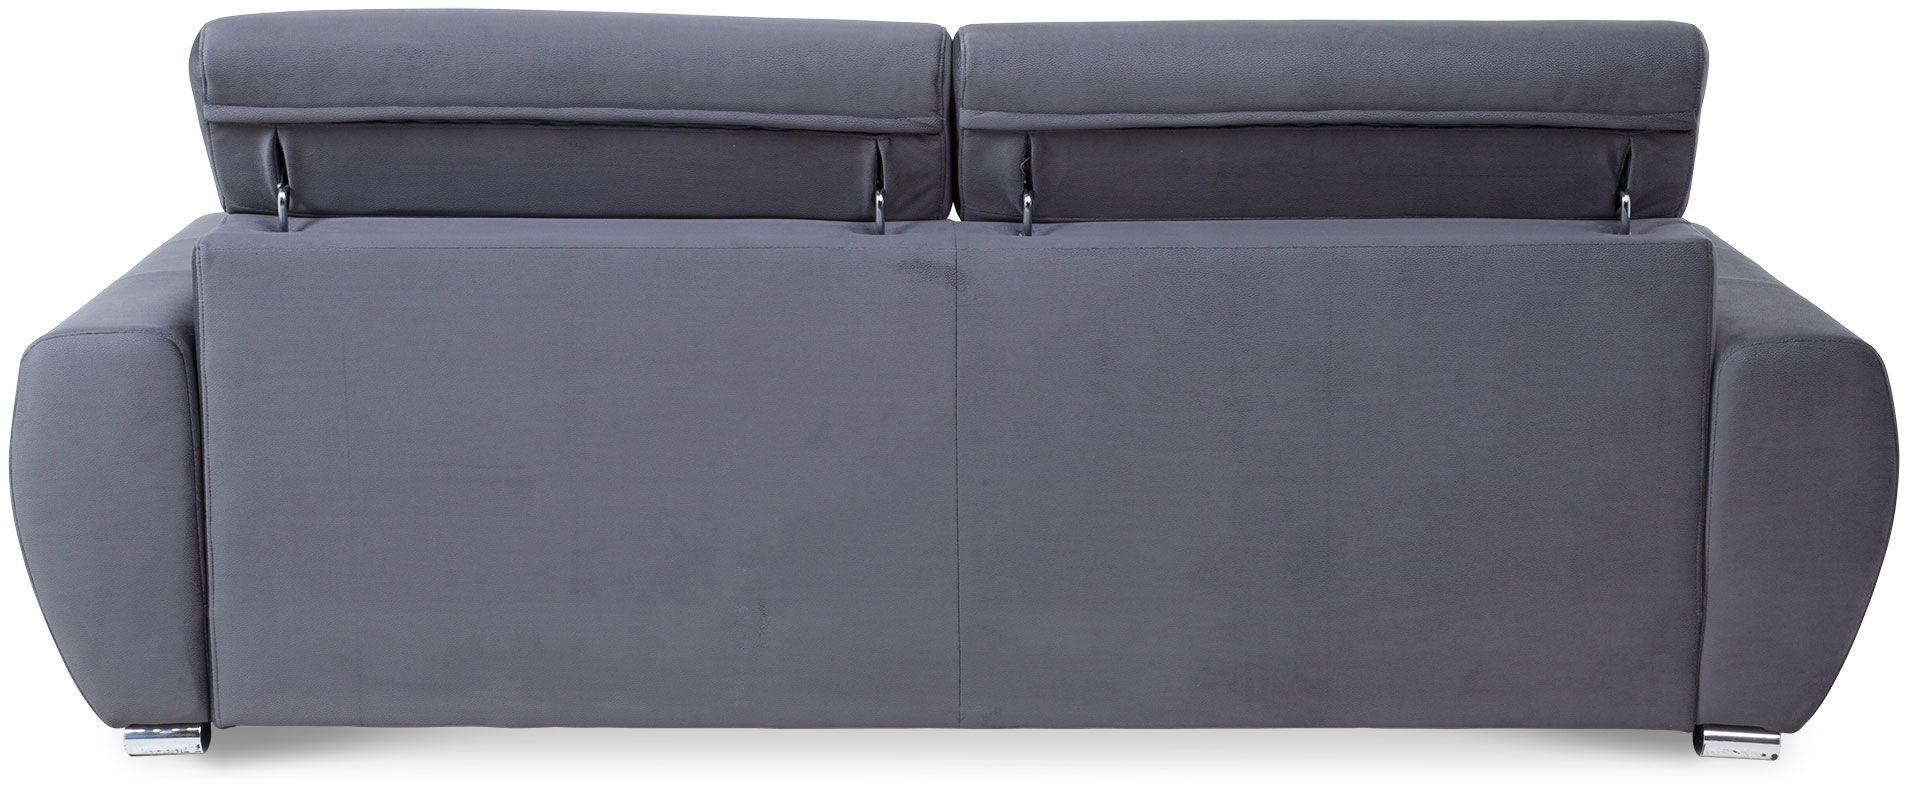 sofa matteo popiel solar96 7